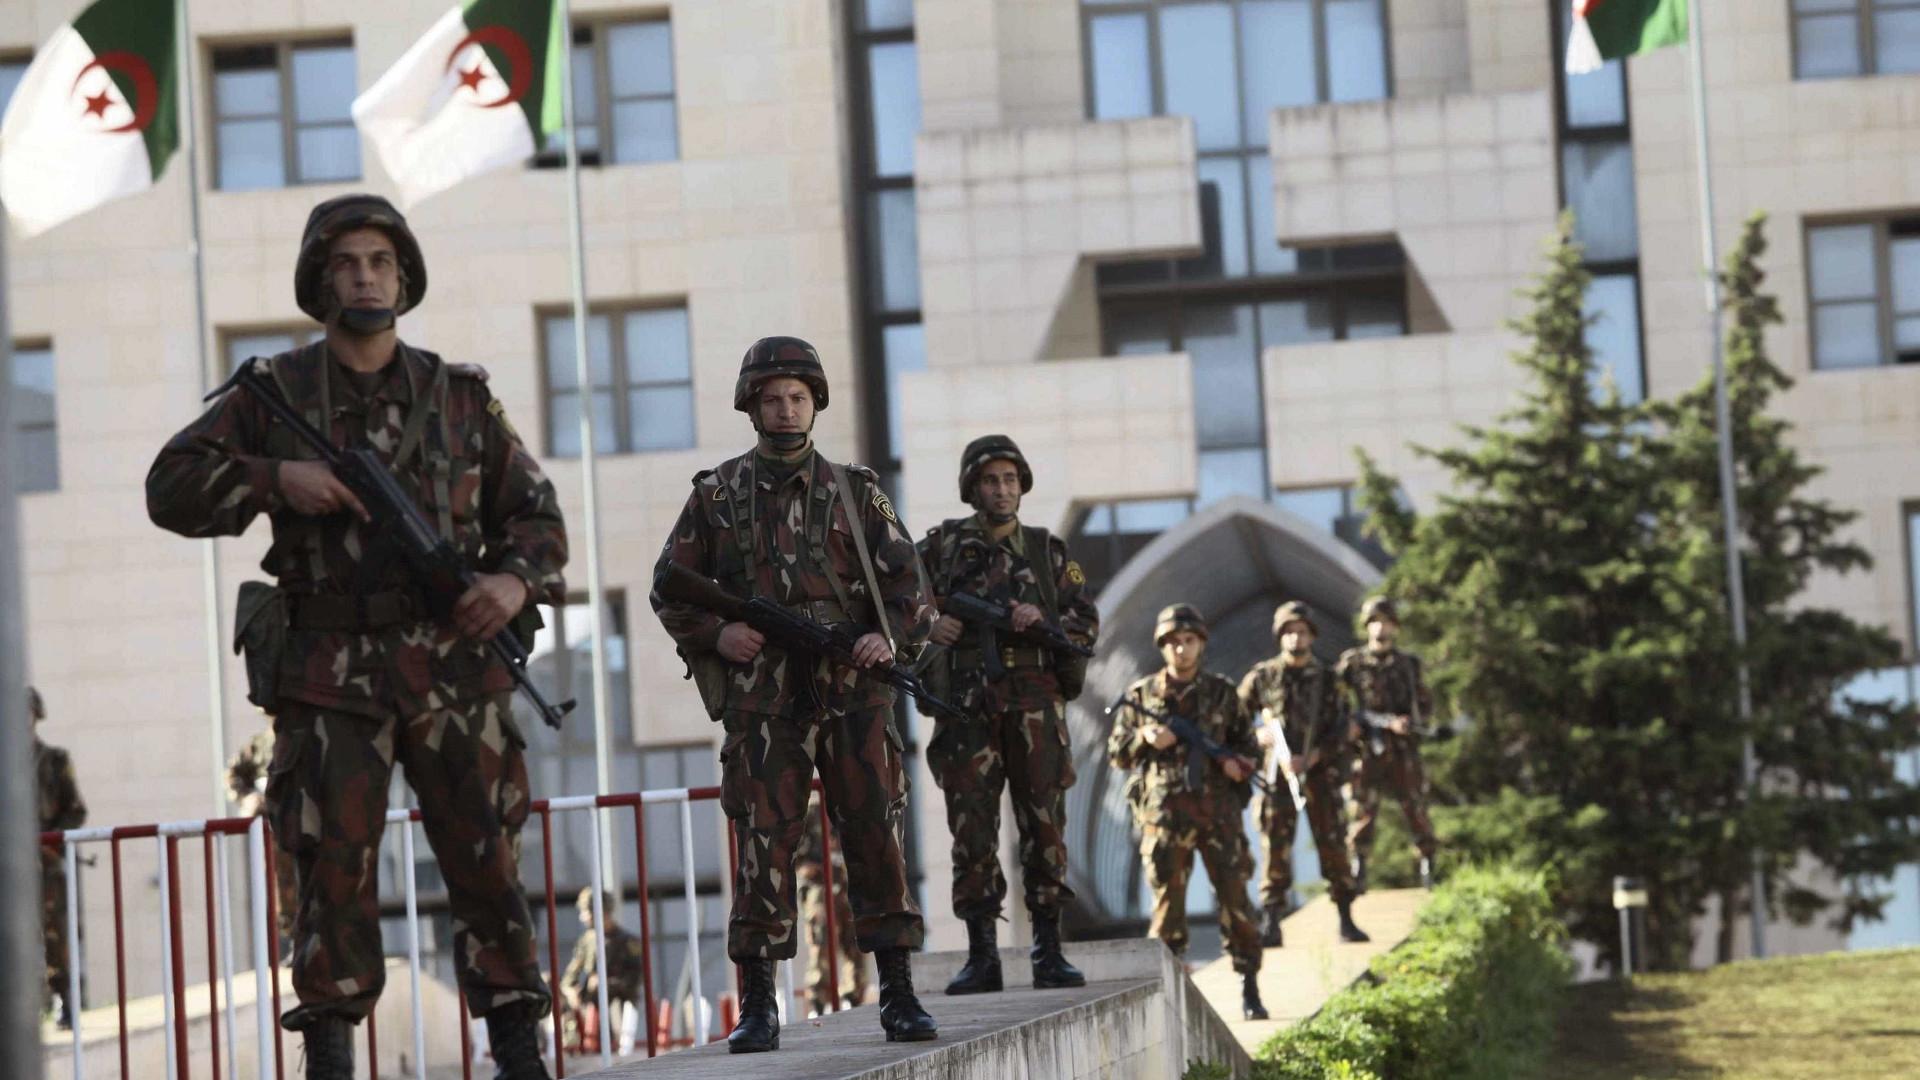 Exército argelino deteve dois presumíveis jihadistas